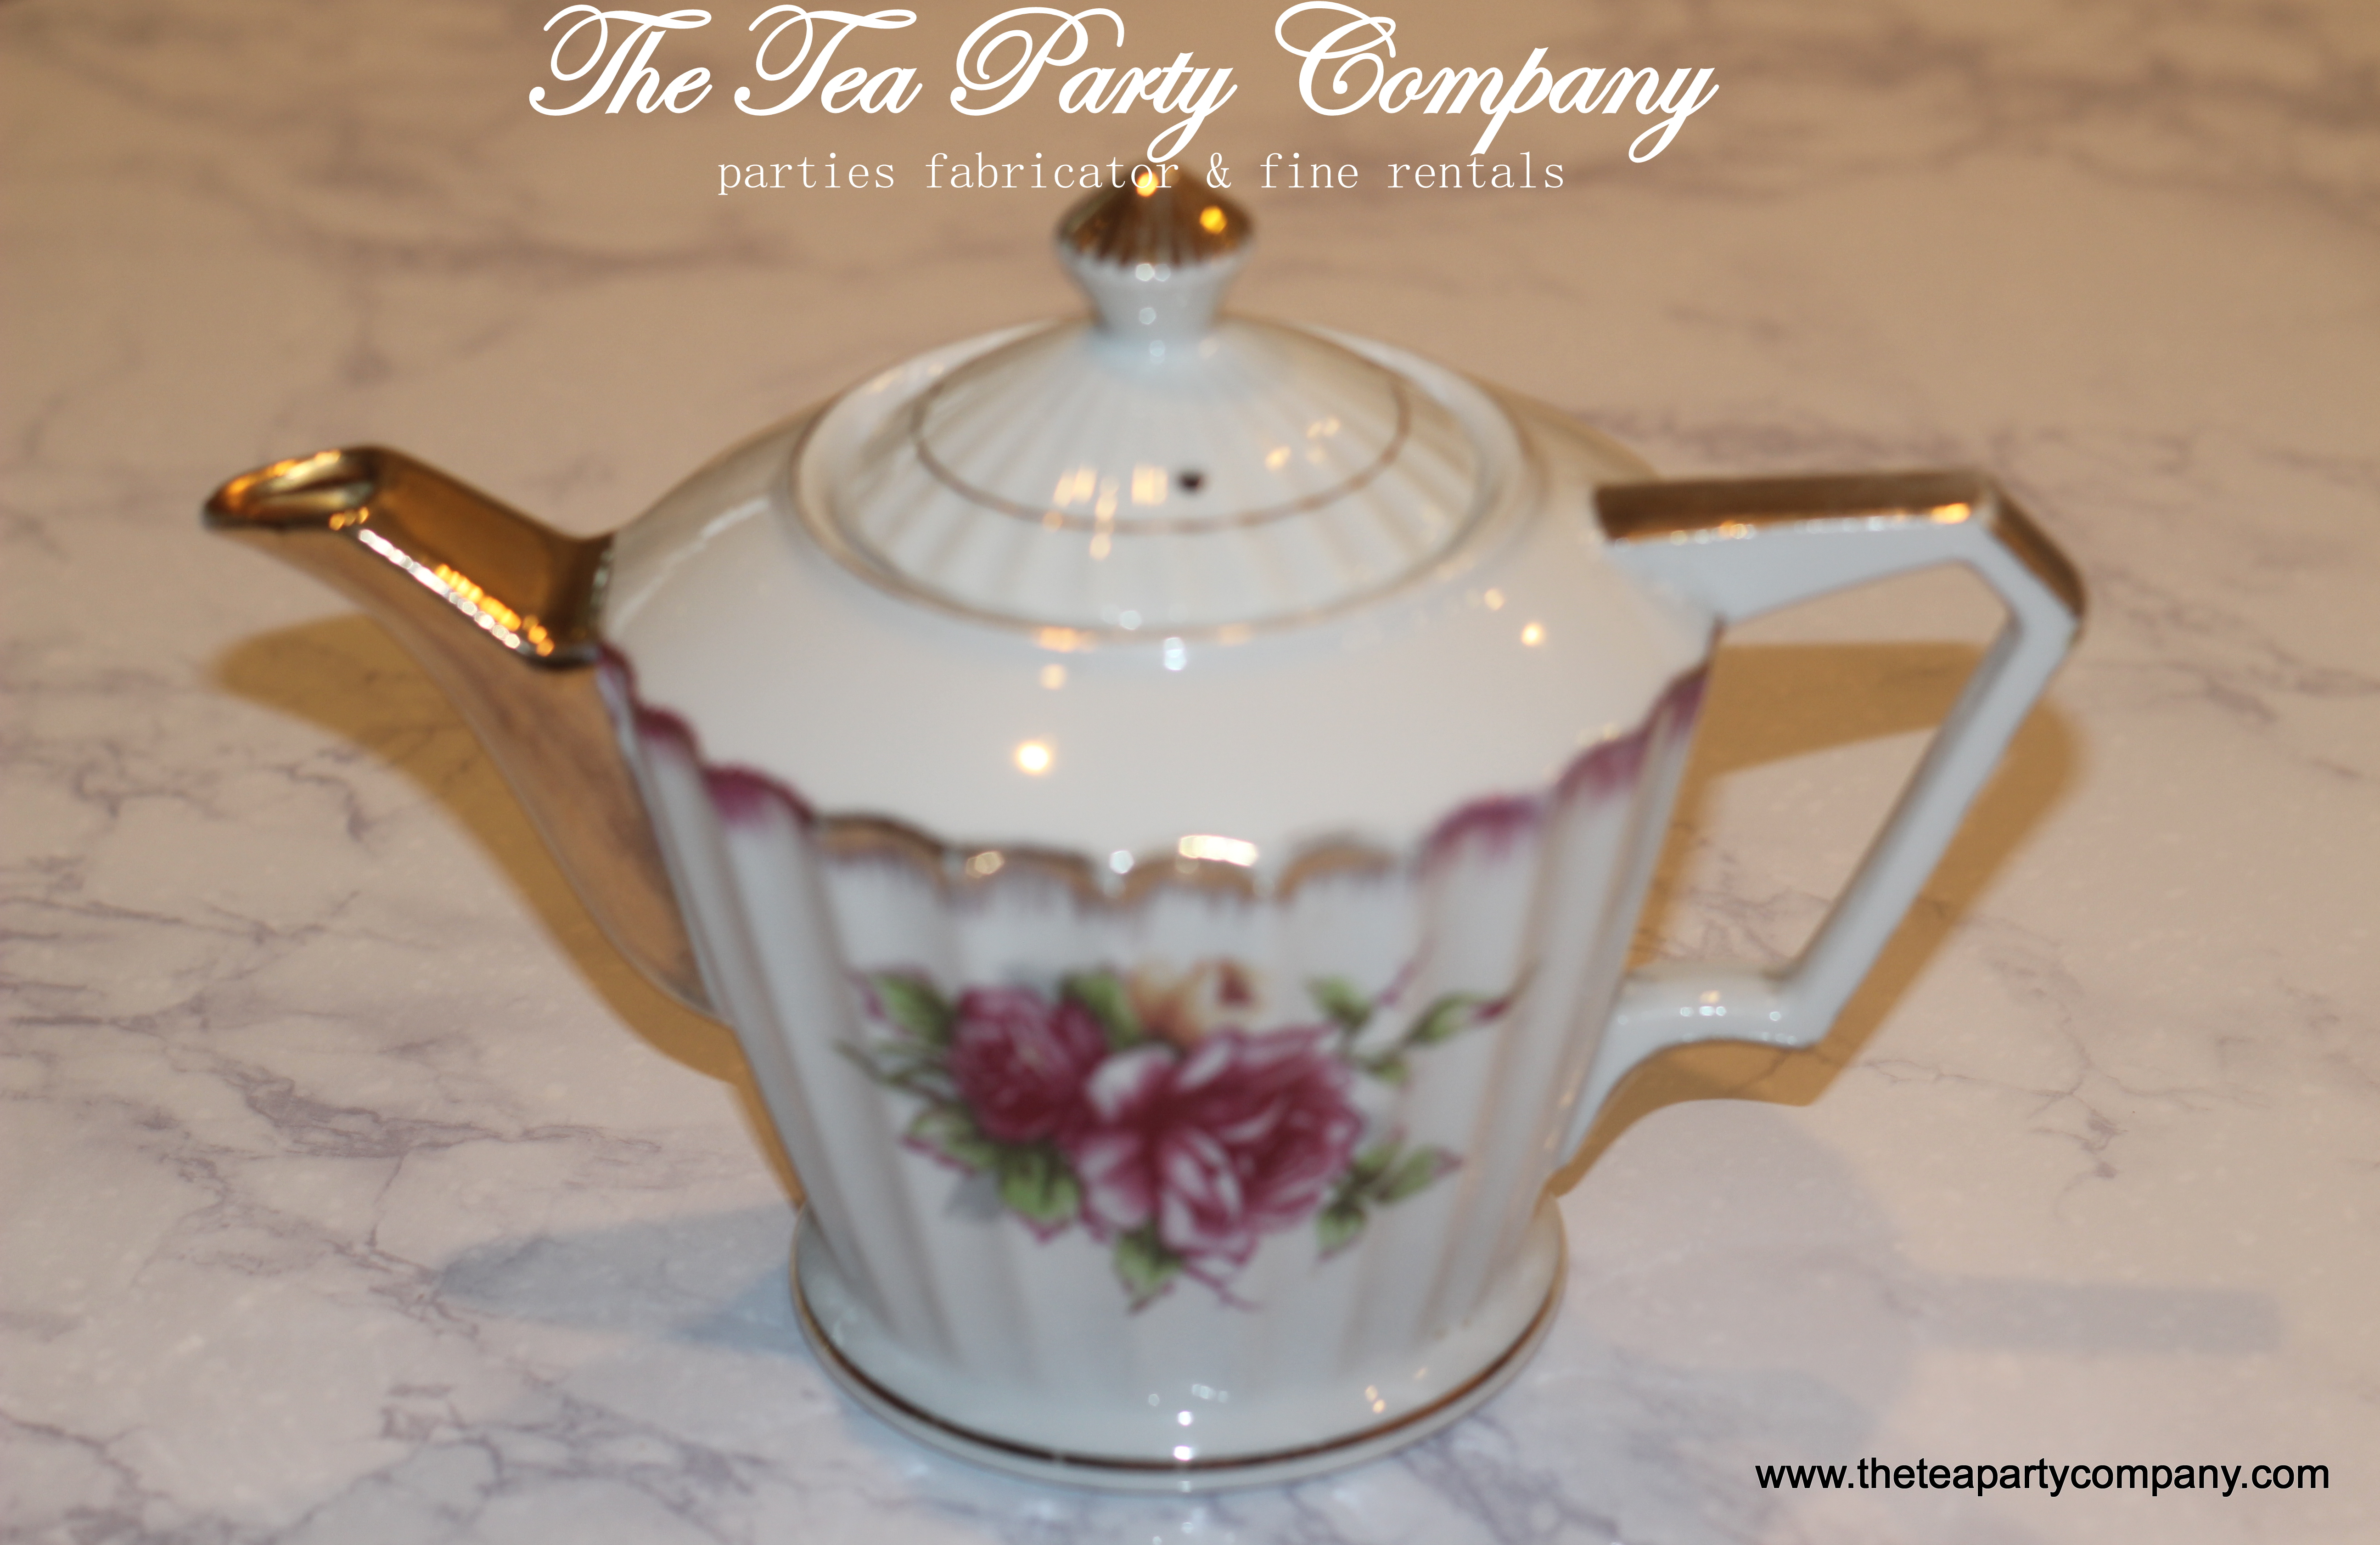 Mismatch Tea Pots The Tea Party Company (13)